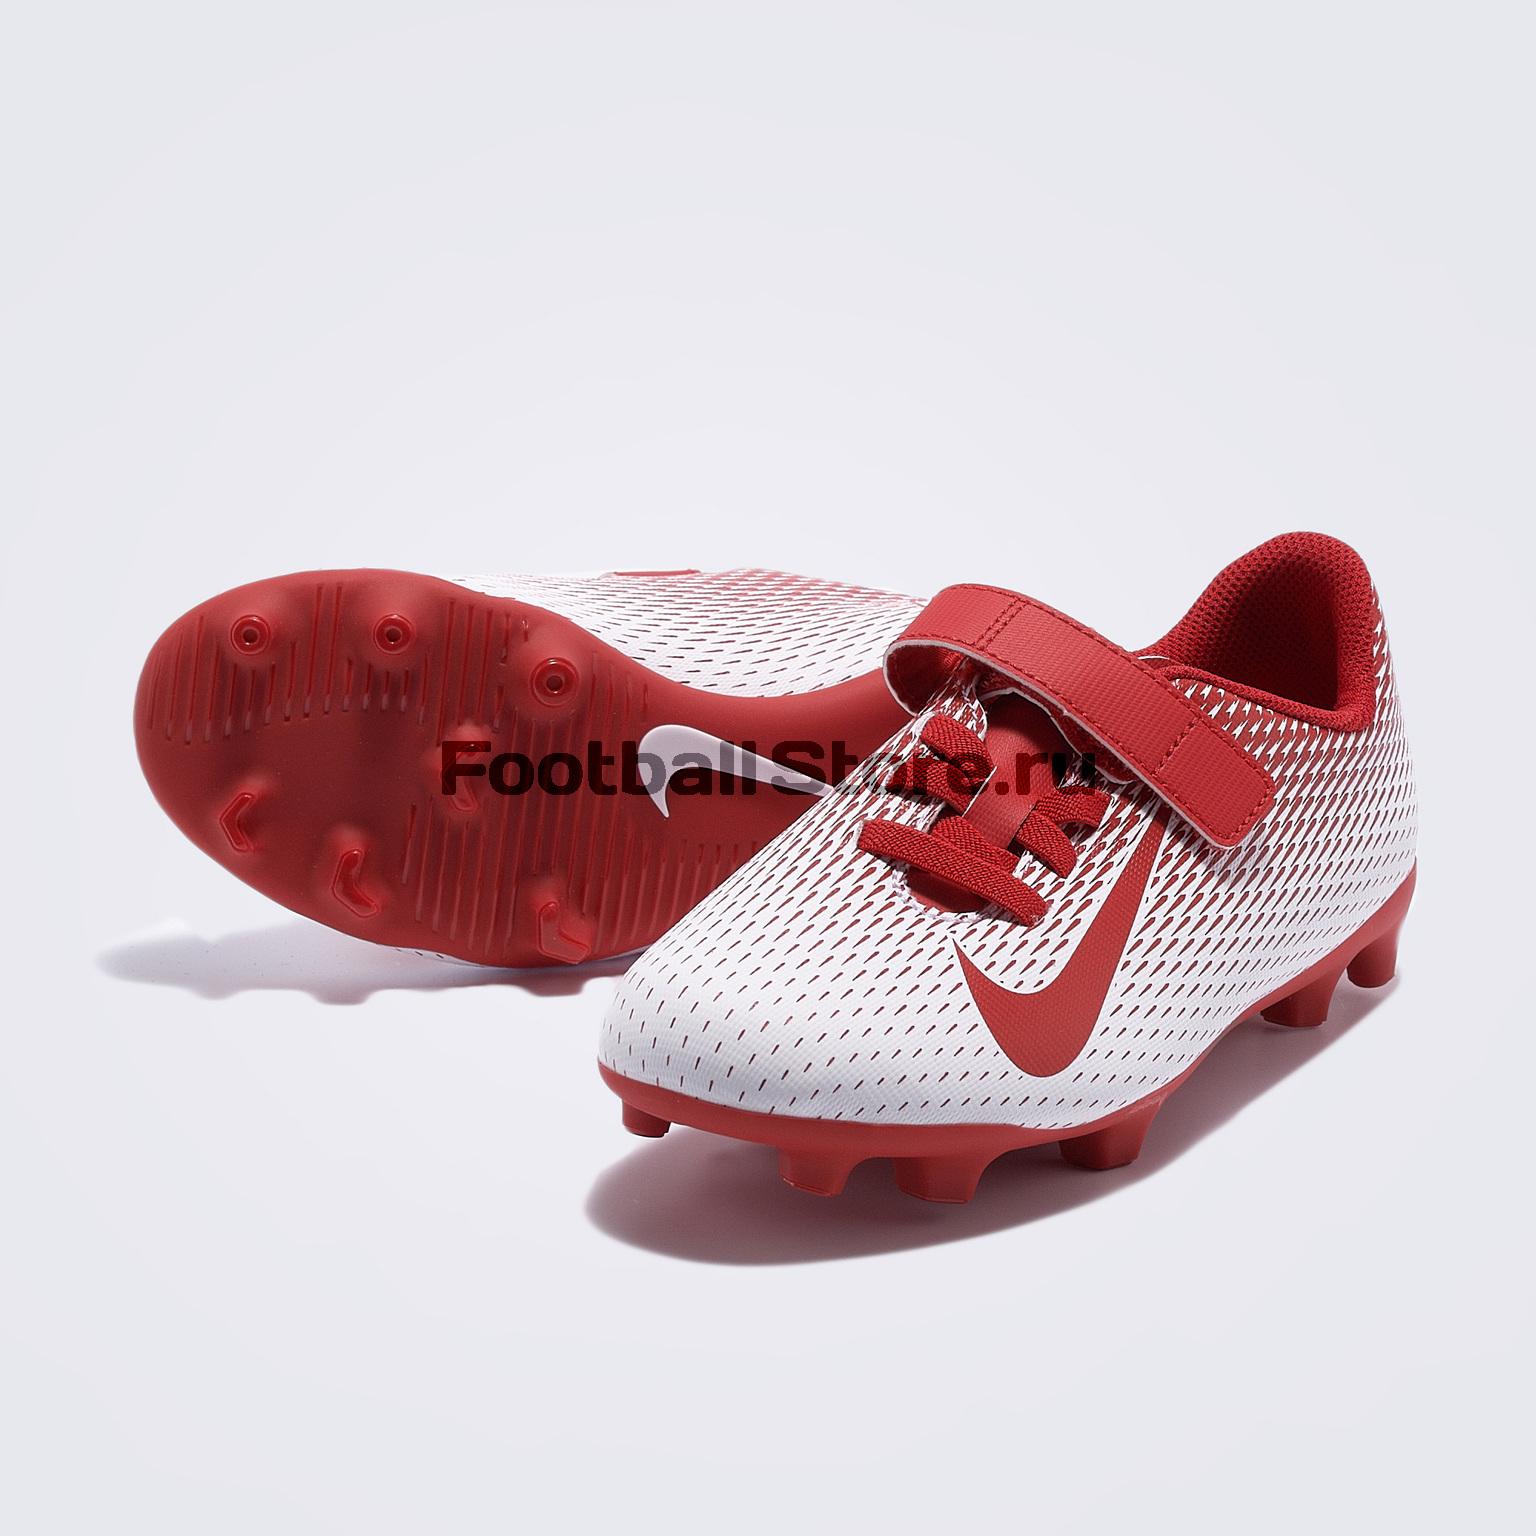 Бутсы детские Nike Bravata II (V) FG 844434-177 бутсы для мальчика nike jrbravata ii fg цвет желтый черный 844442 070 размер 13c 30